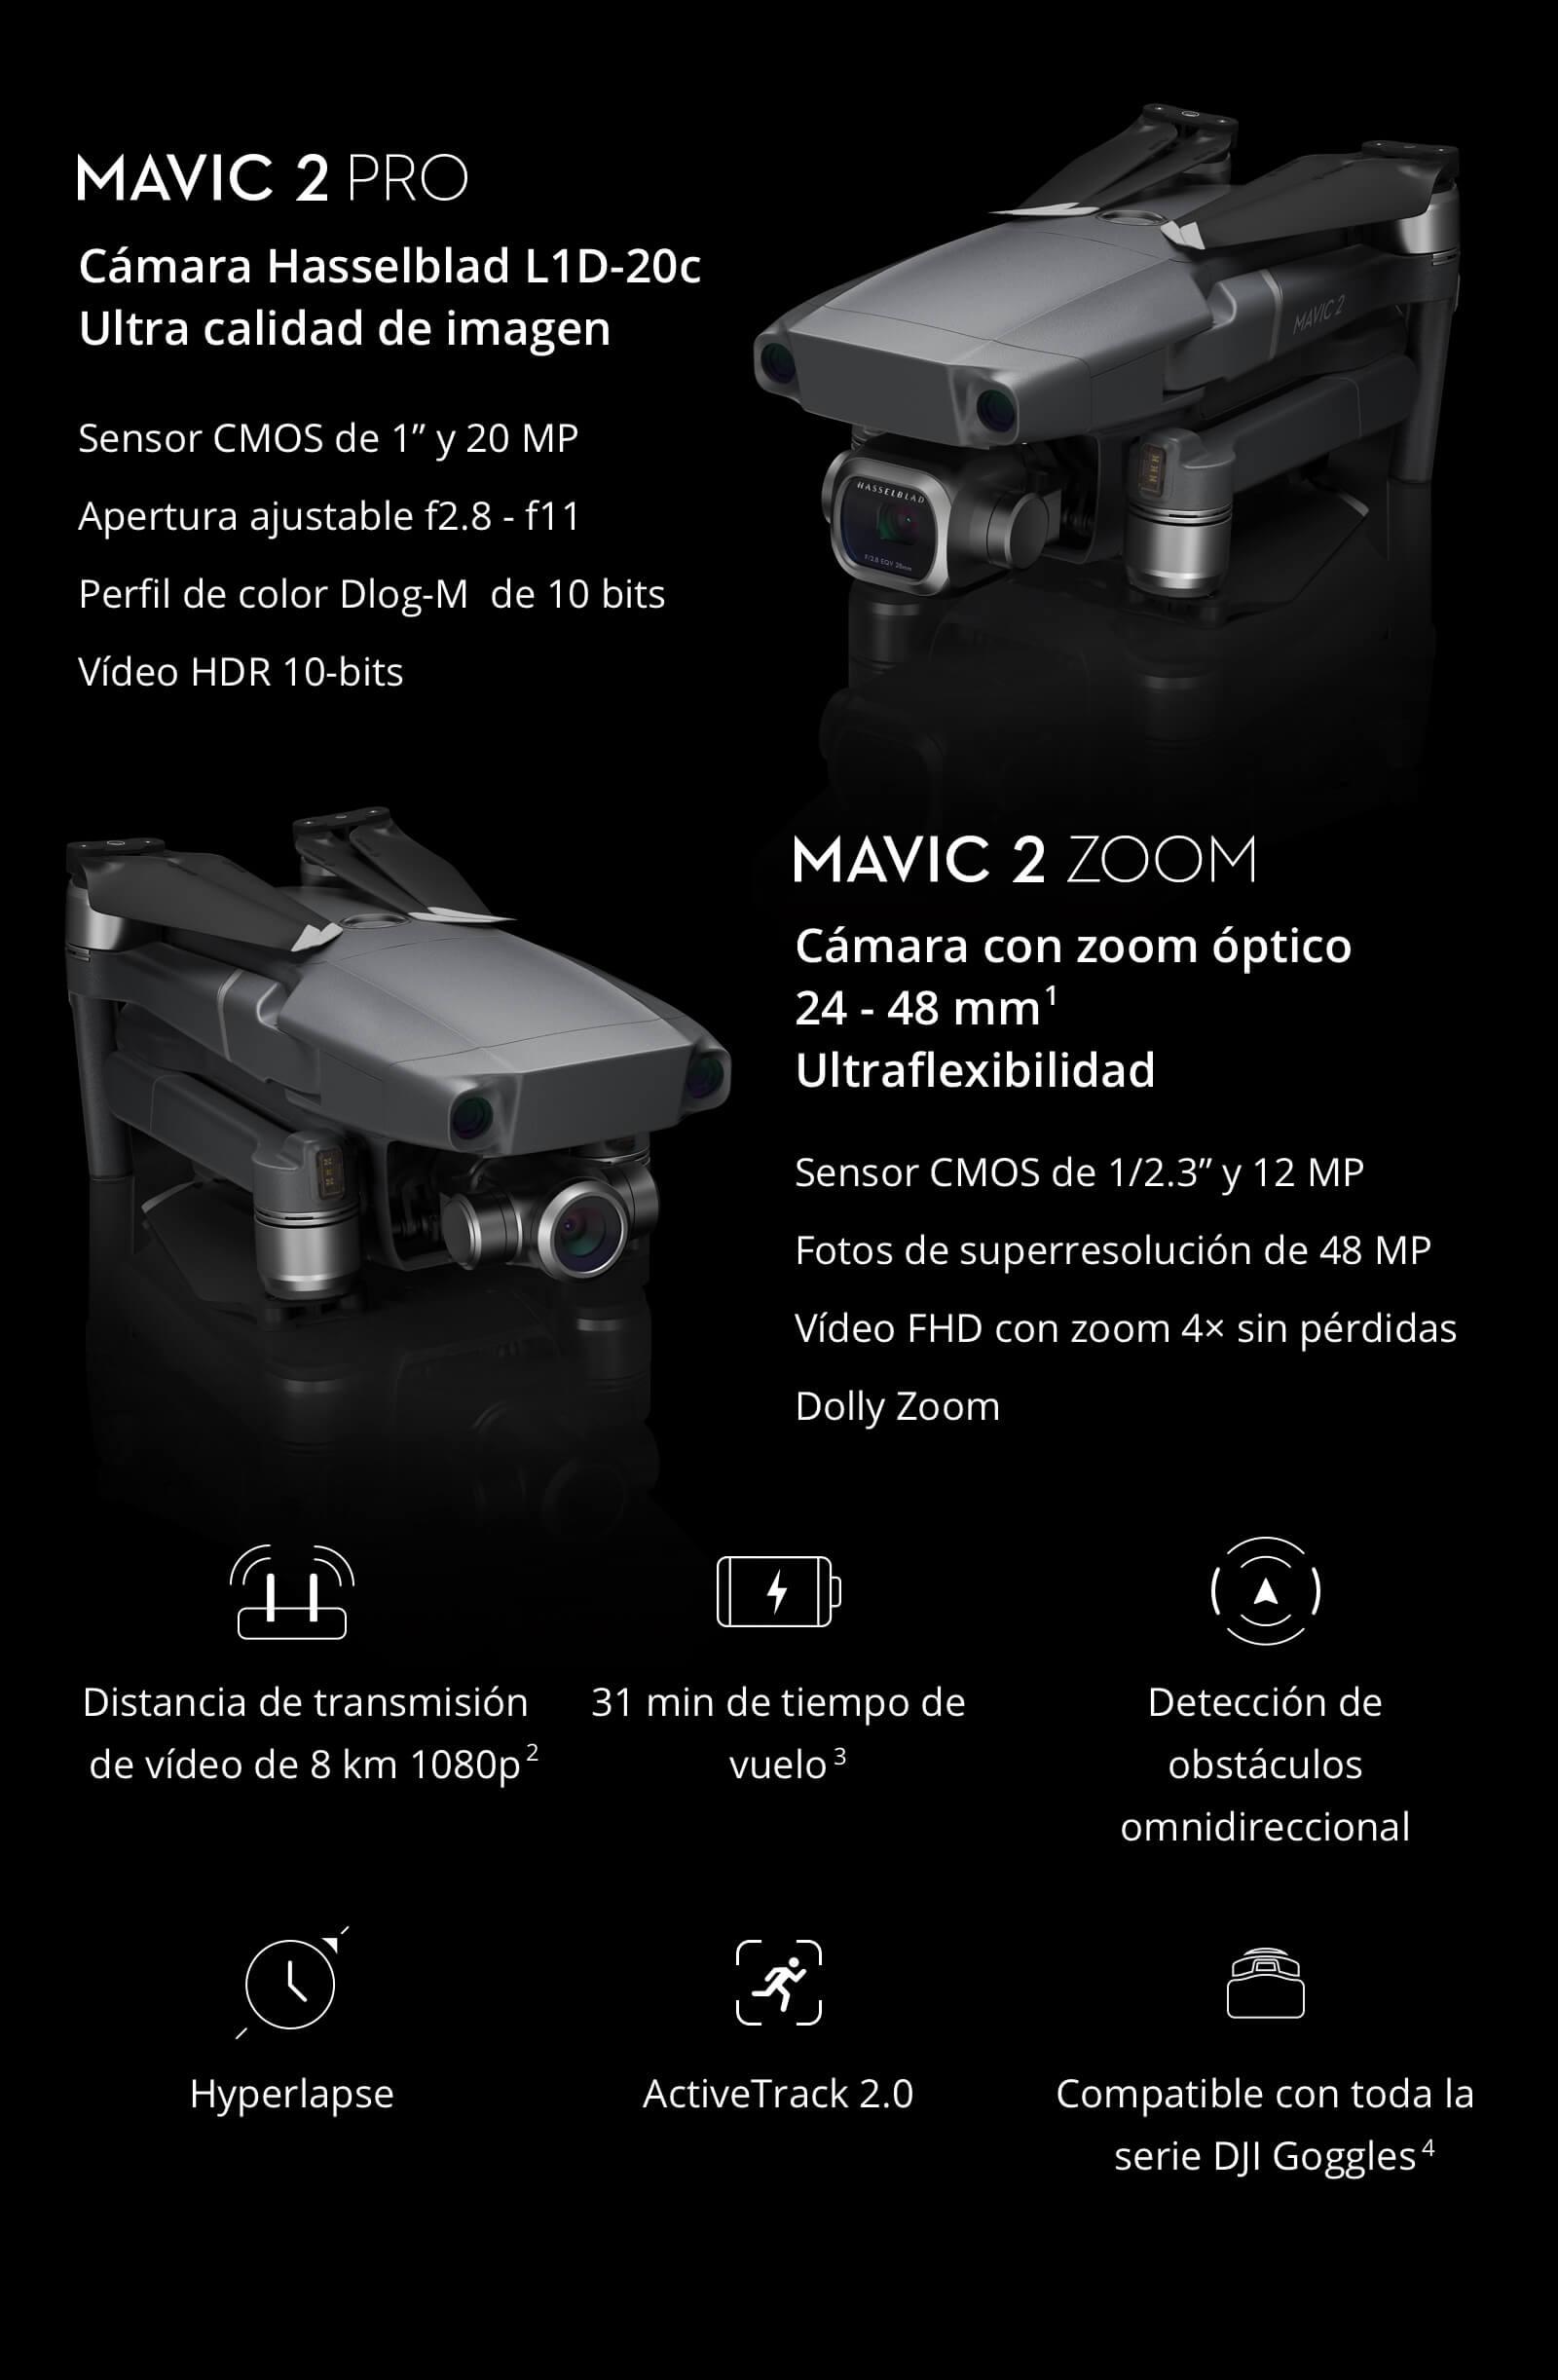 DJI Mavic 2 comprar barato al precio minimo de oferta con cupón descuento. Con envío GRATIS Libre de aduanas para España.